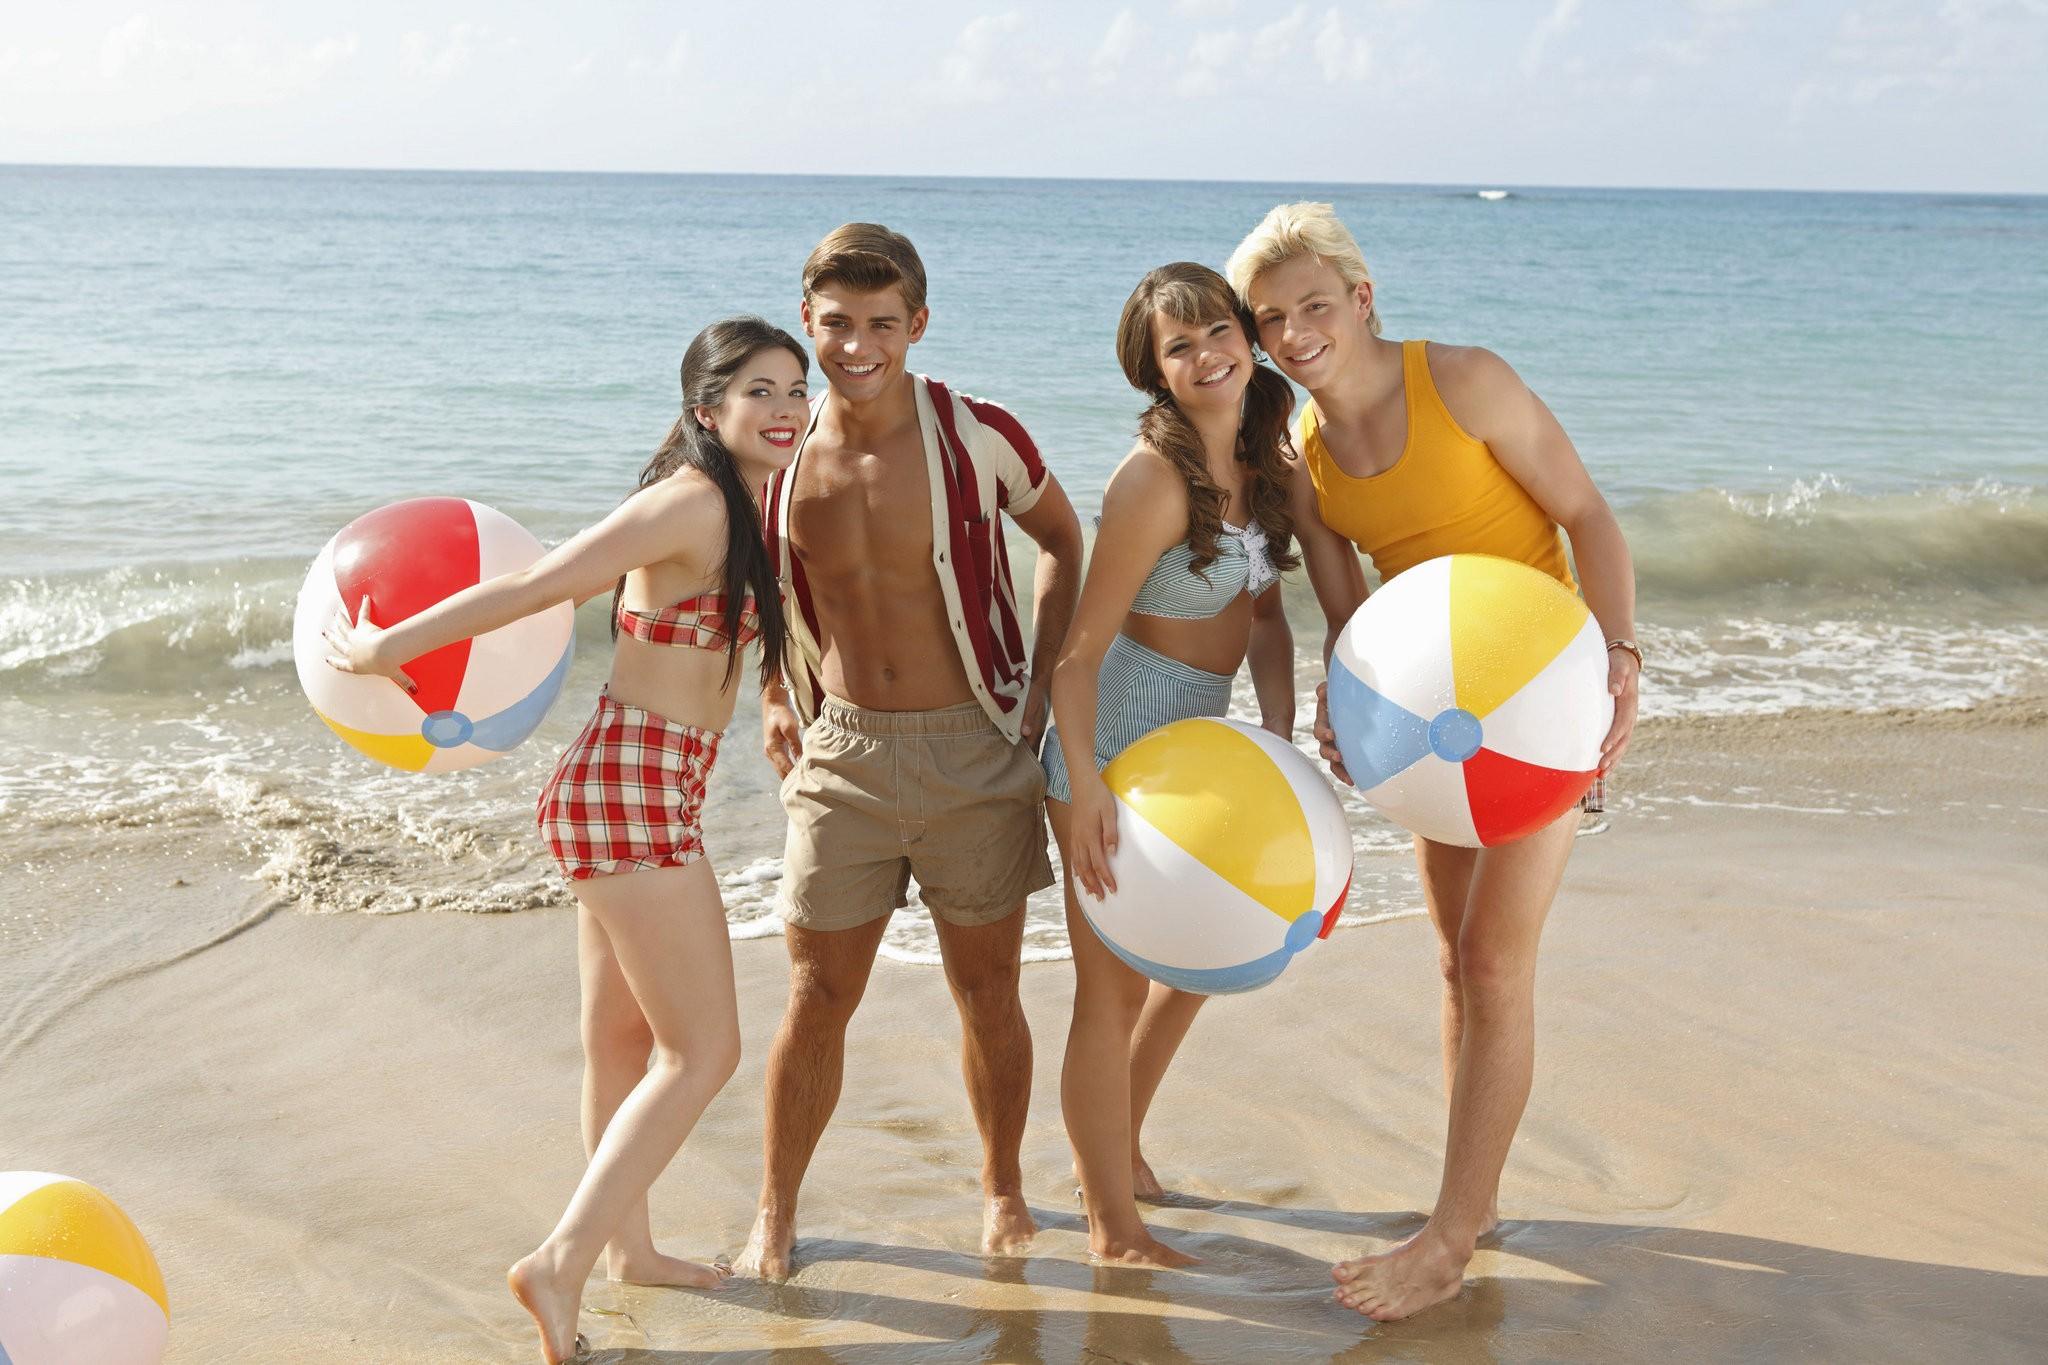 Starlets in 'Teen Beach Movie' crush on '60s style - lehighvalleylive.com